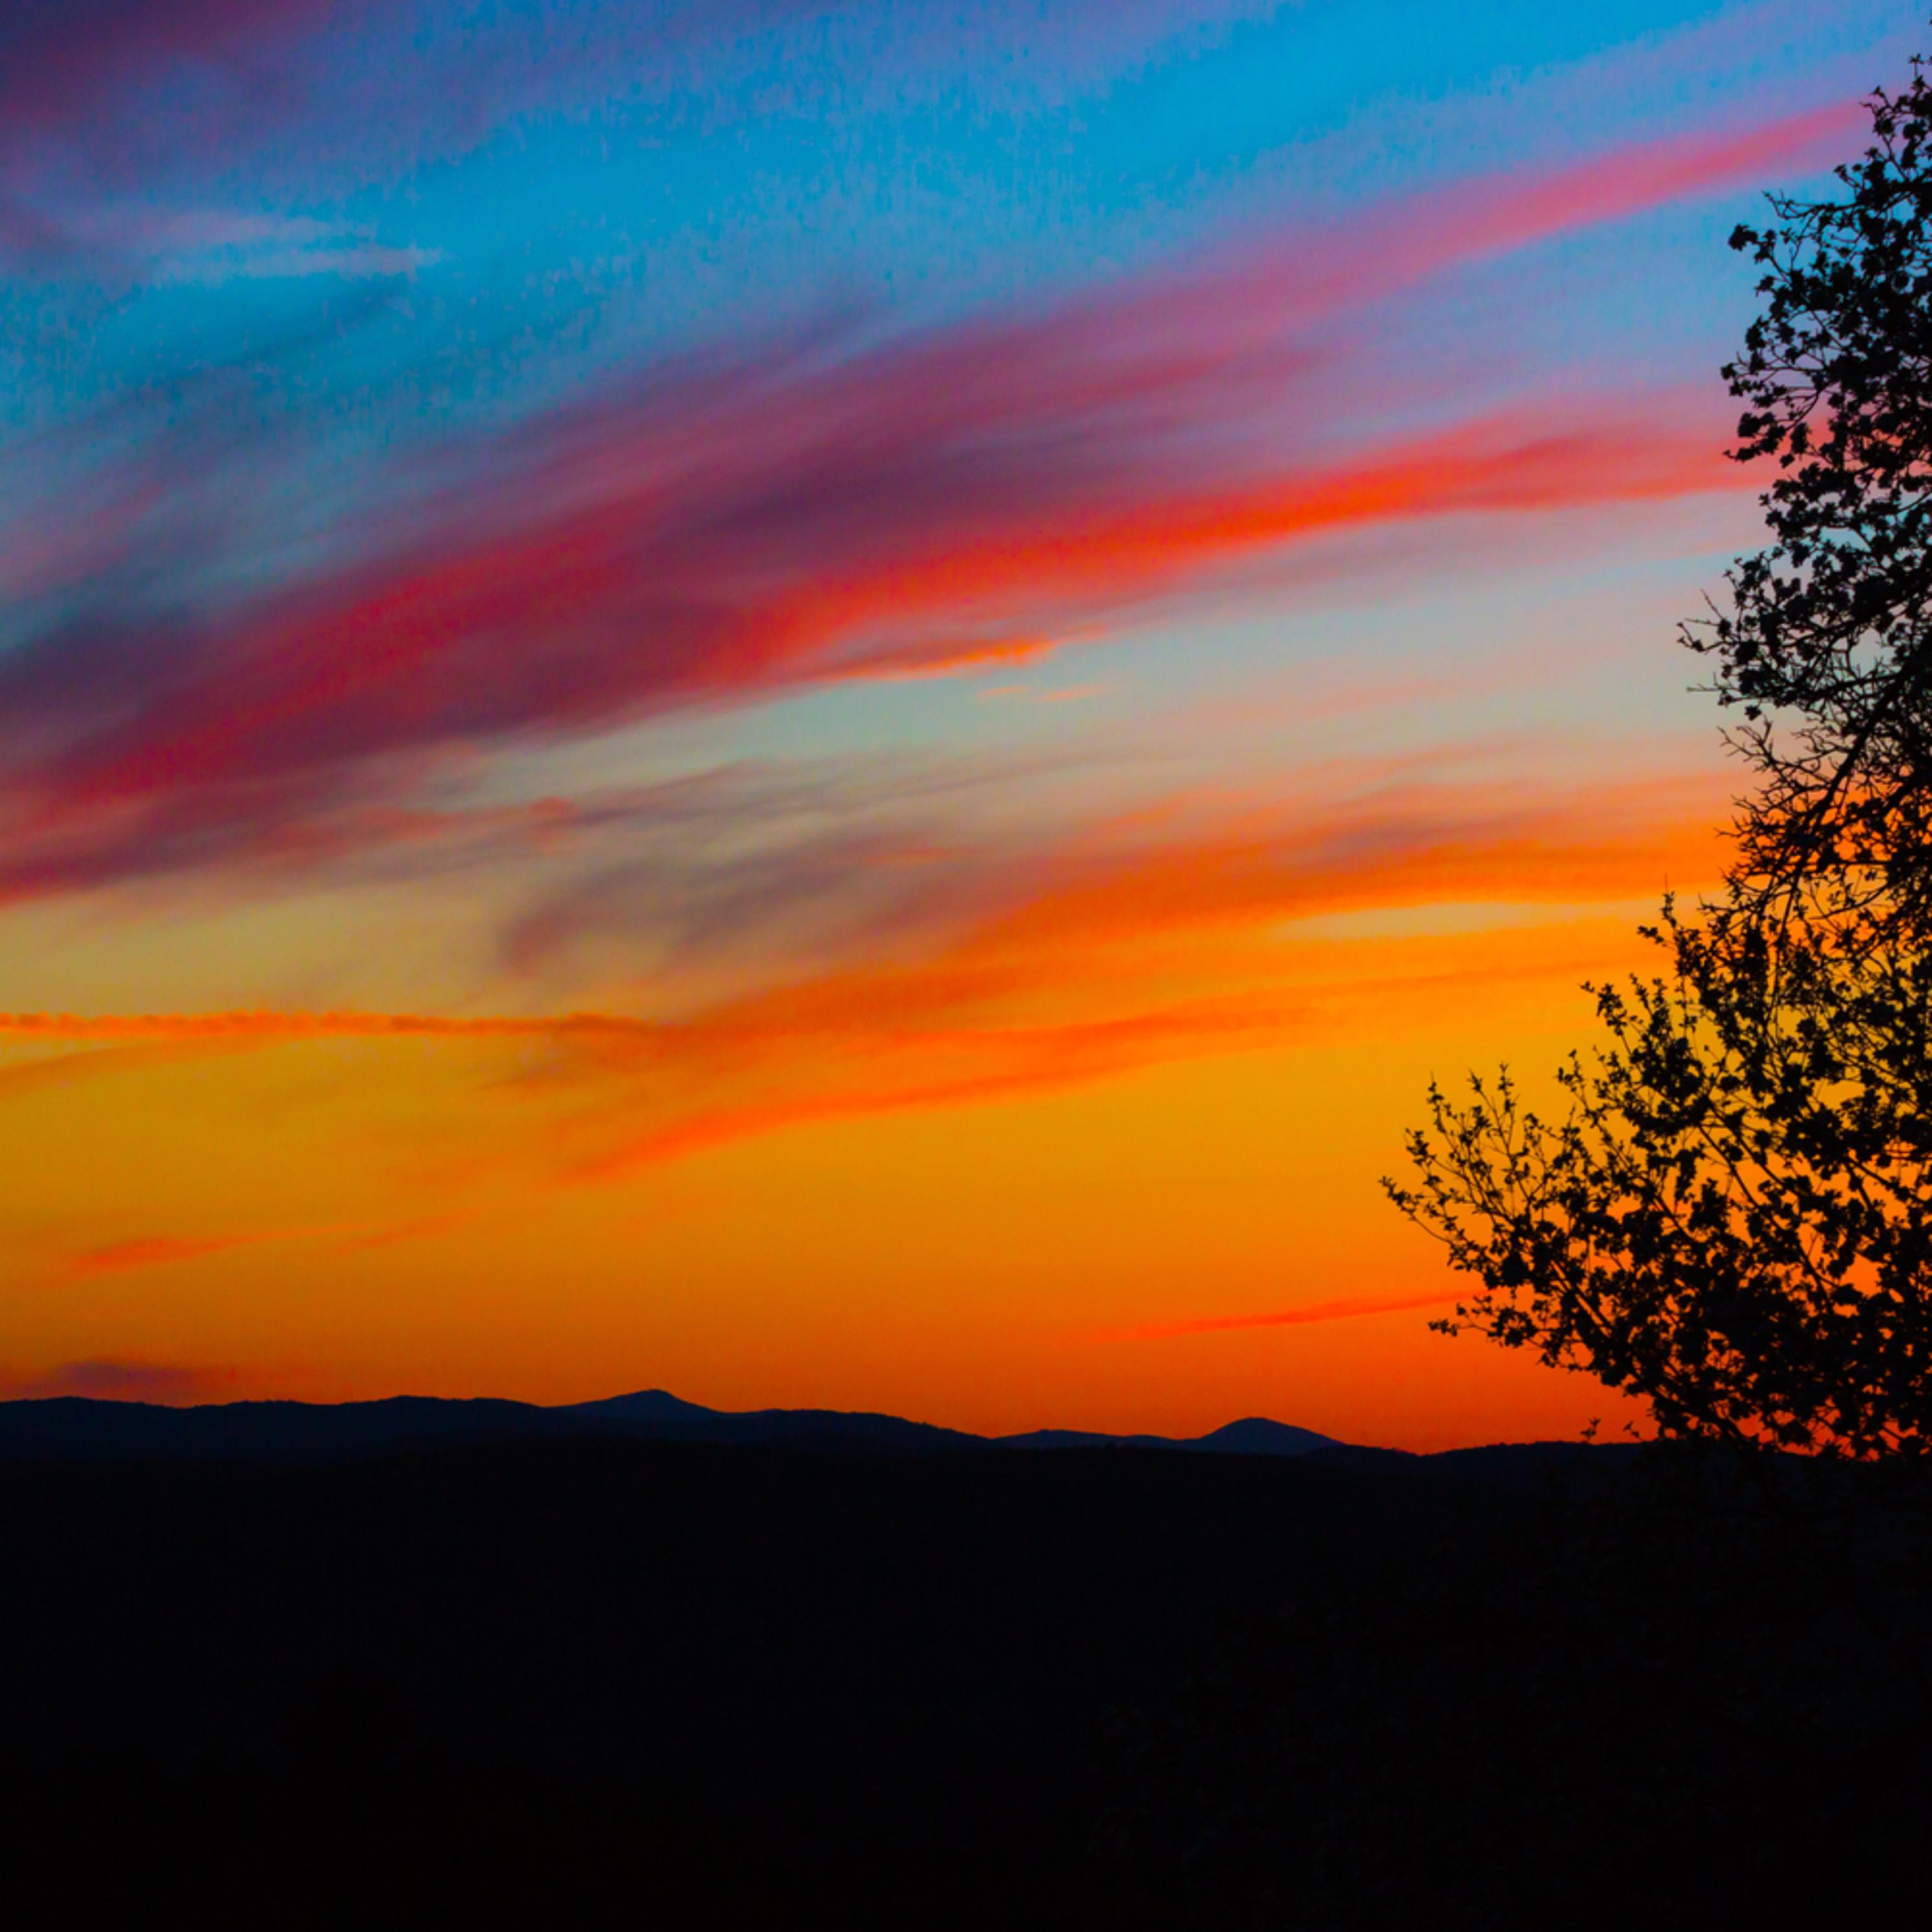 Sunset silhouette ii fyckas